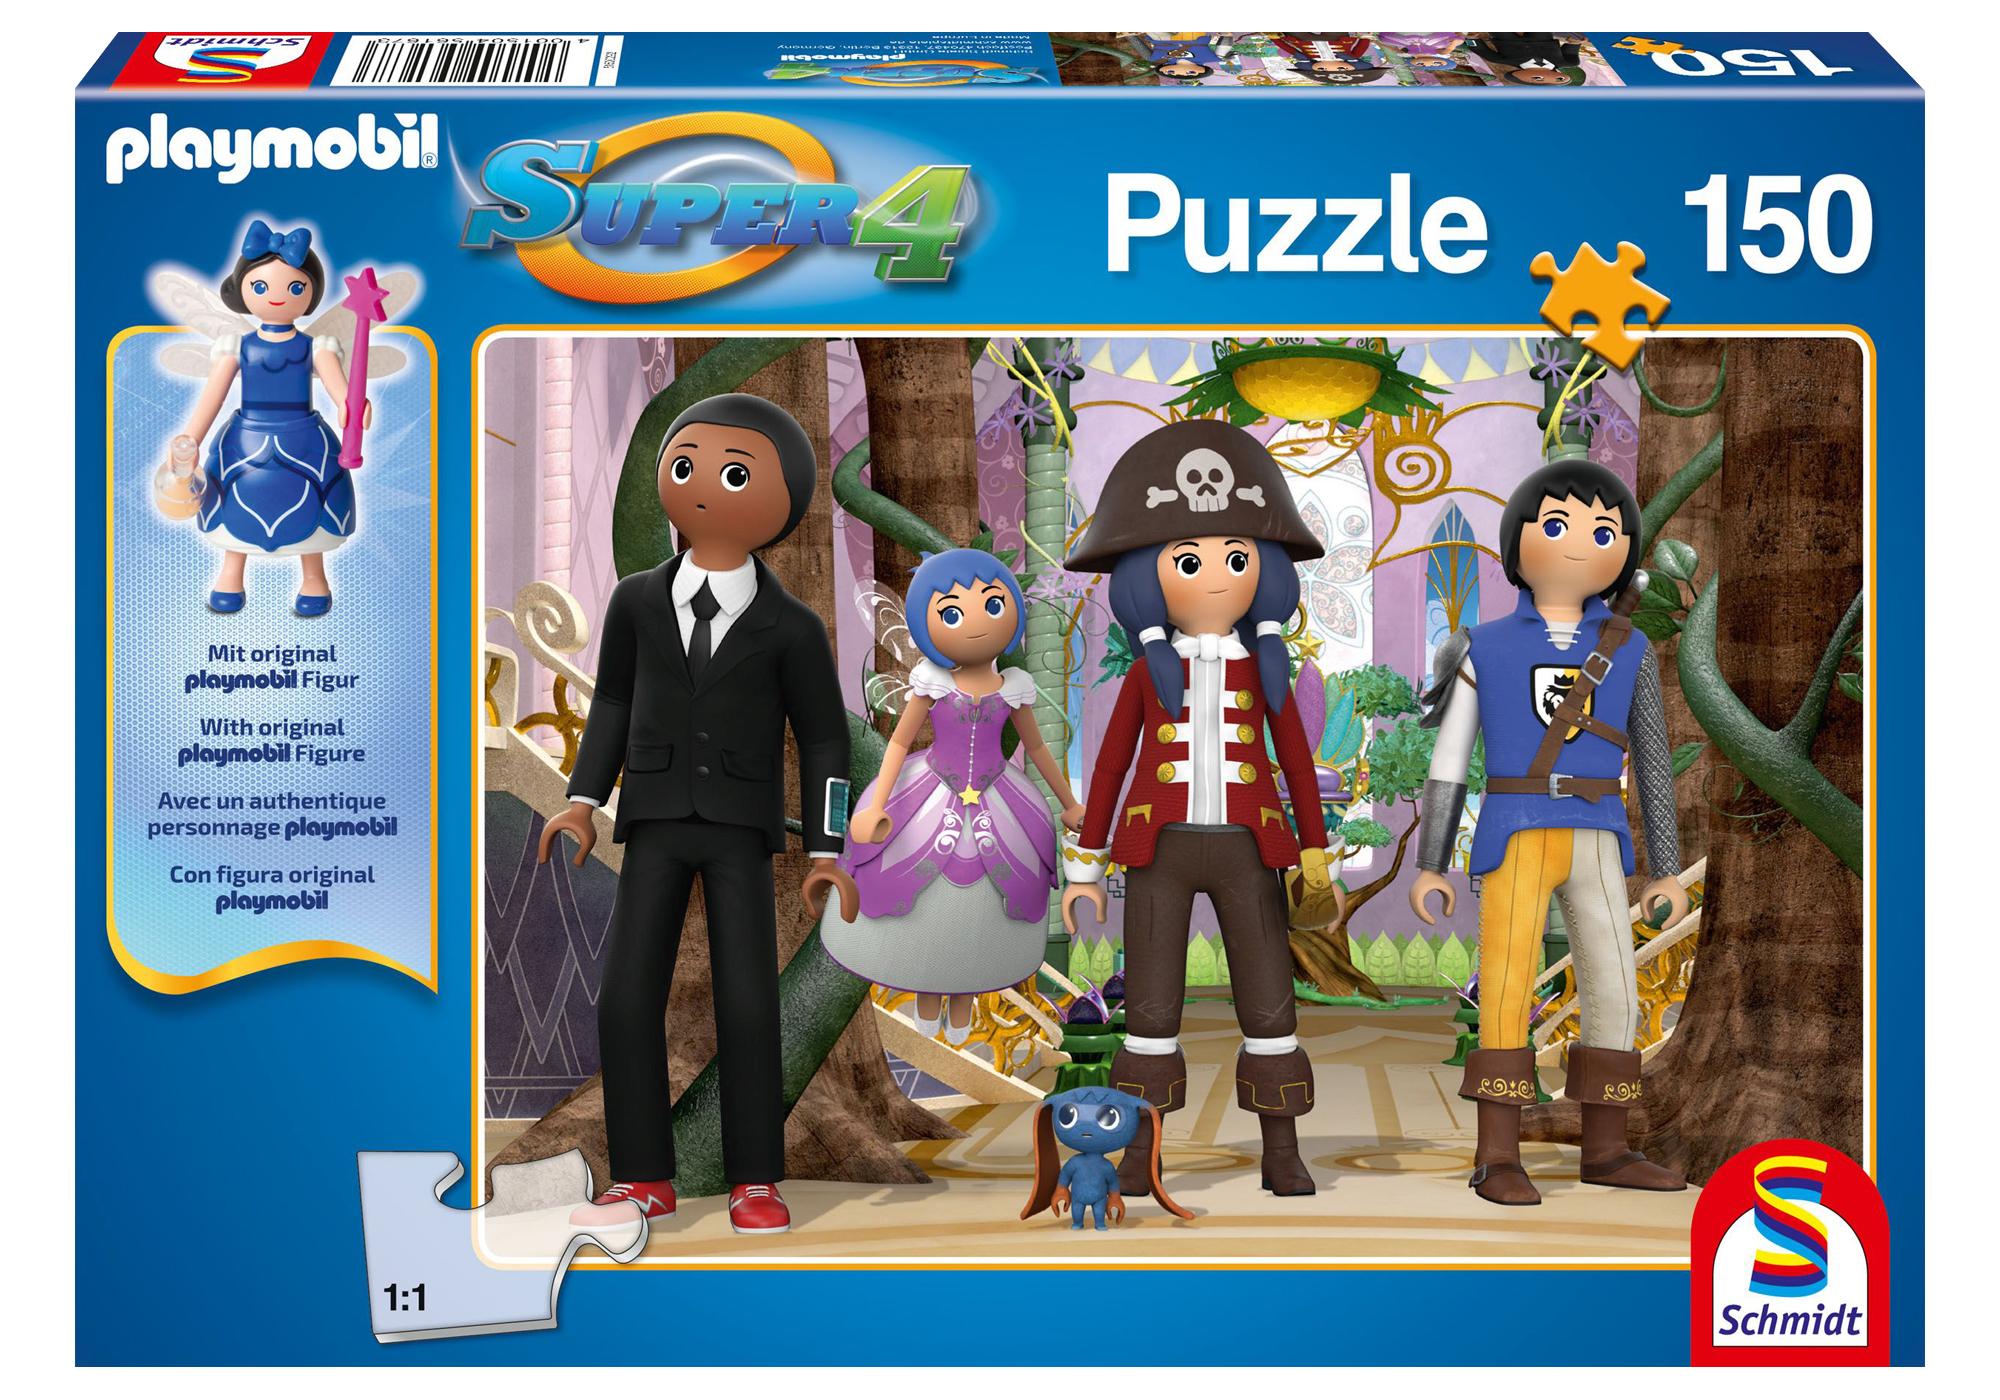 http://media.playmobil.com/i/playmobil/80708_product_detail